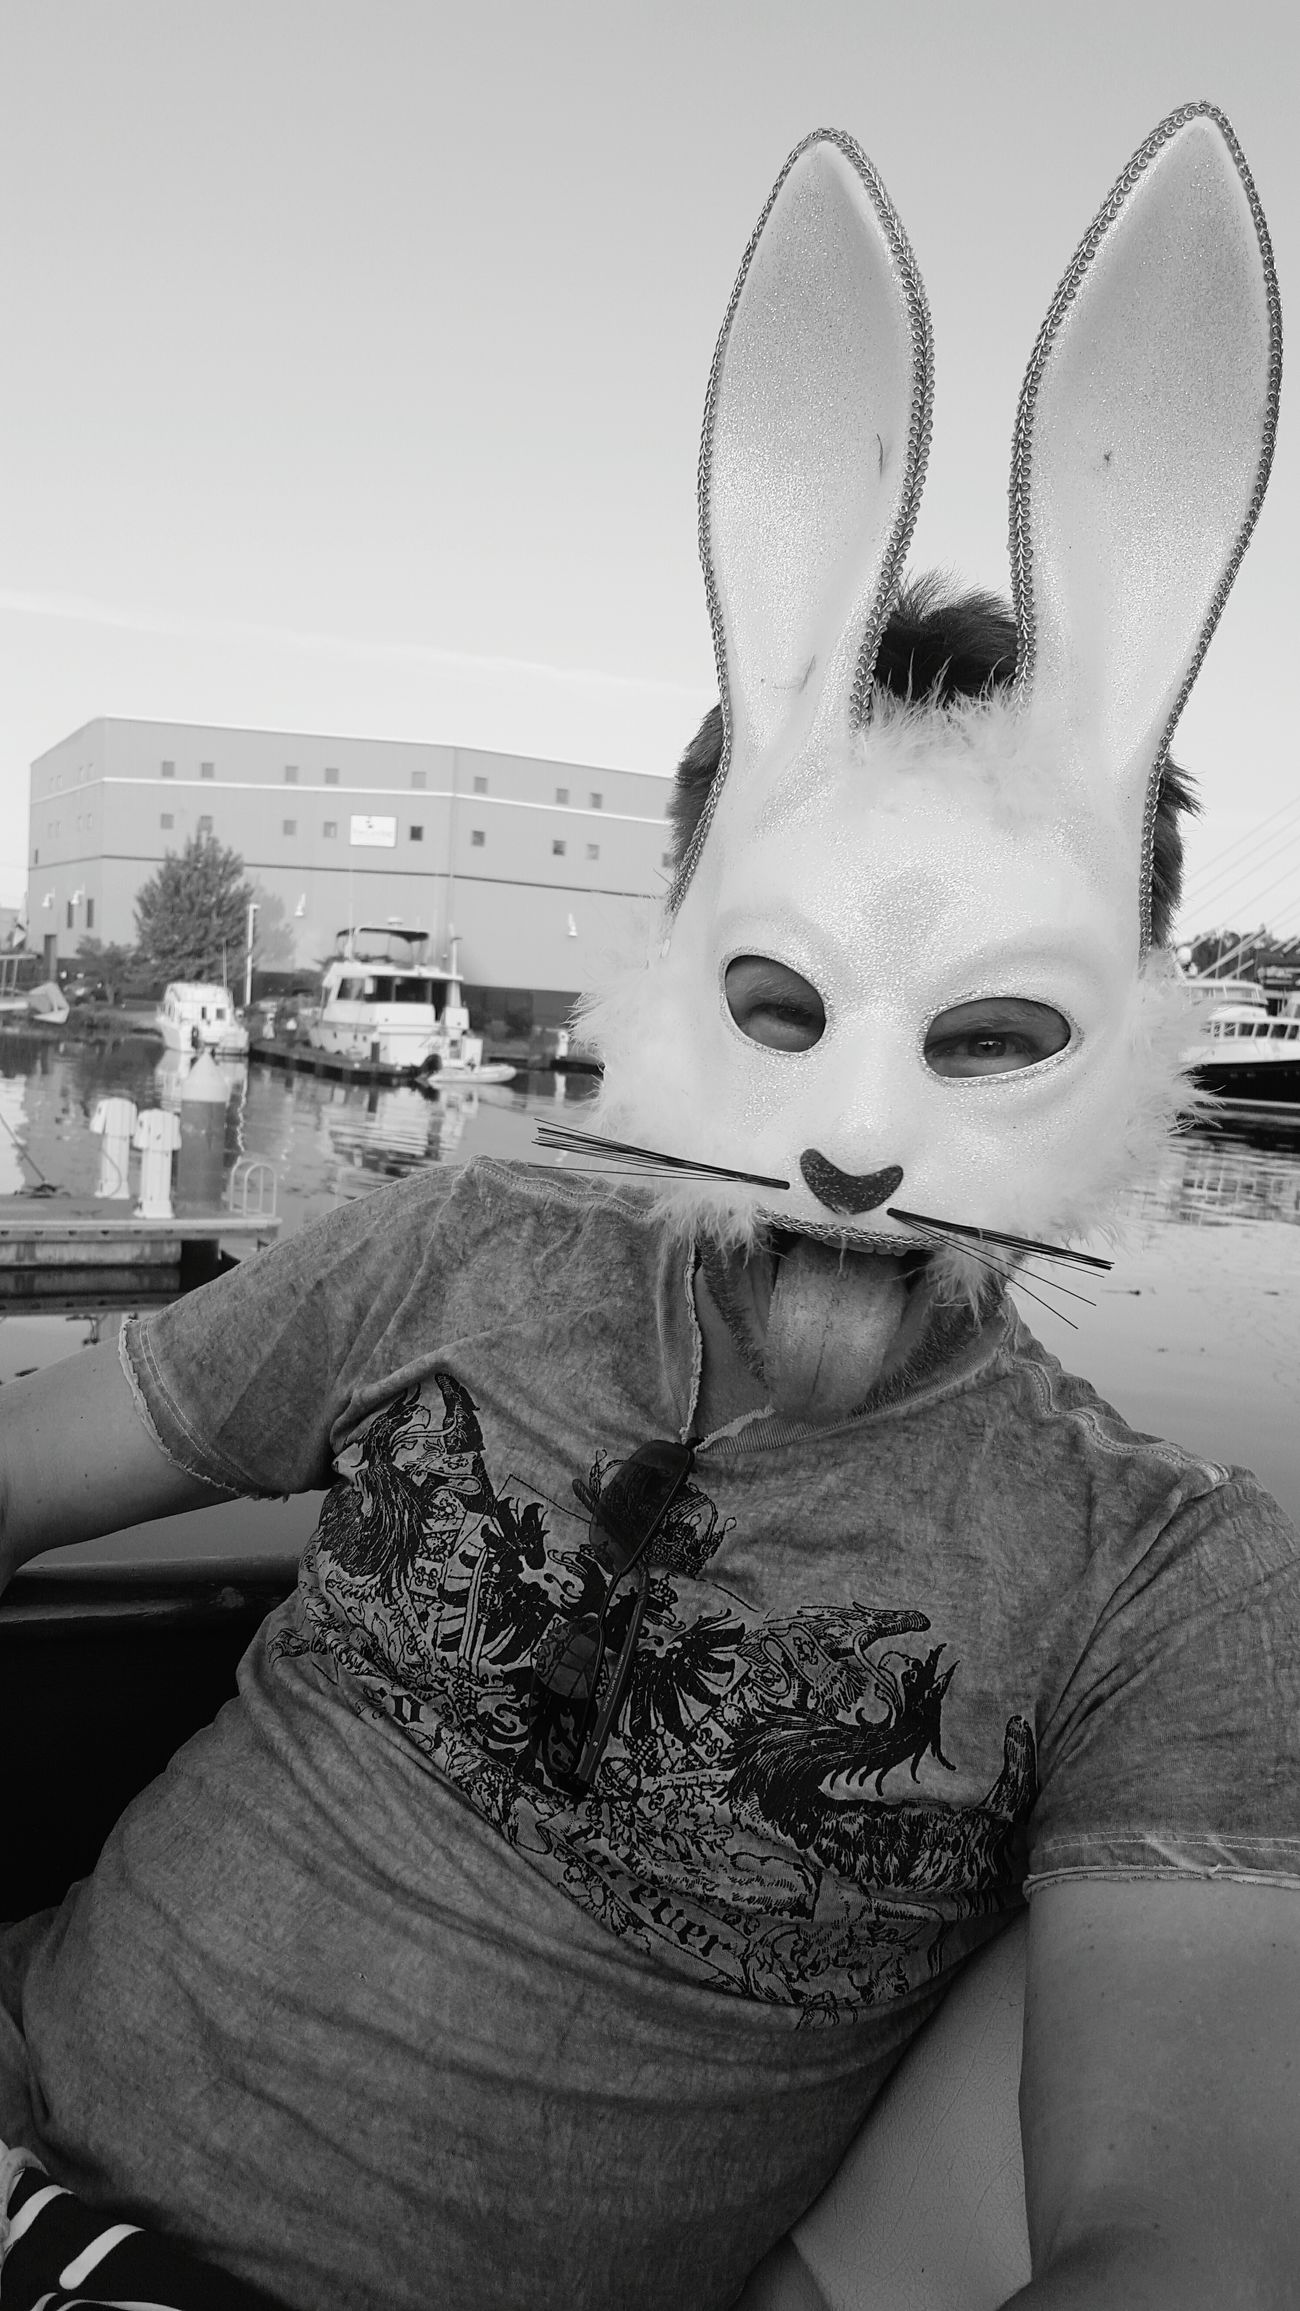 Checked off my bucket list: boating with a bad bunny. Onaboat Tacoma_WA Mask Bunny 🐰 Rabbit BadRabbits Bucketlist